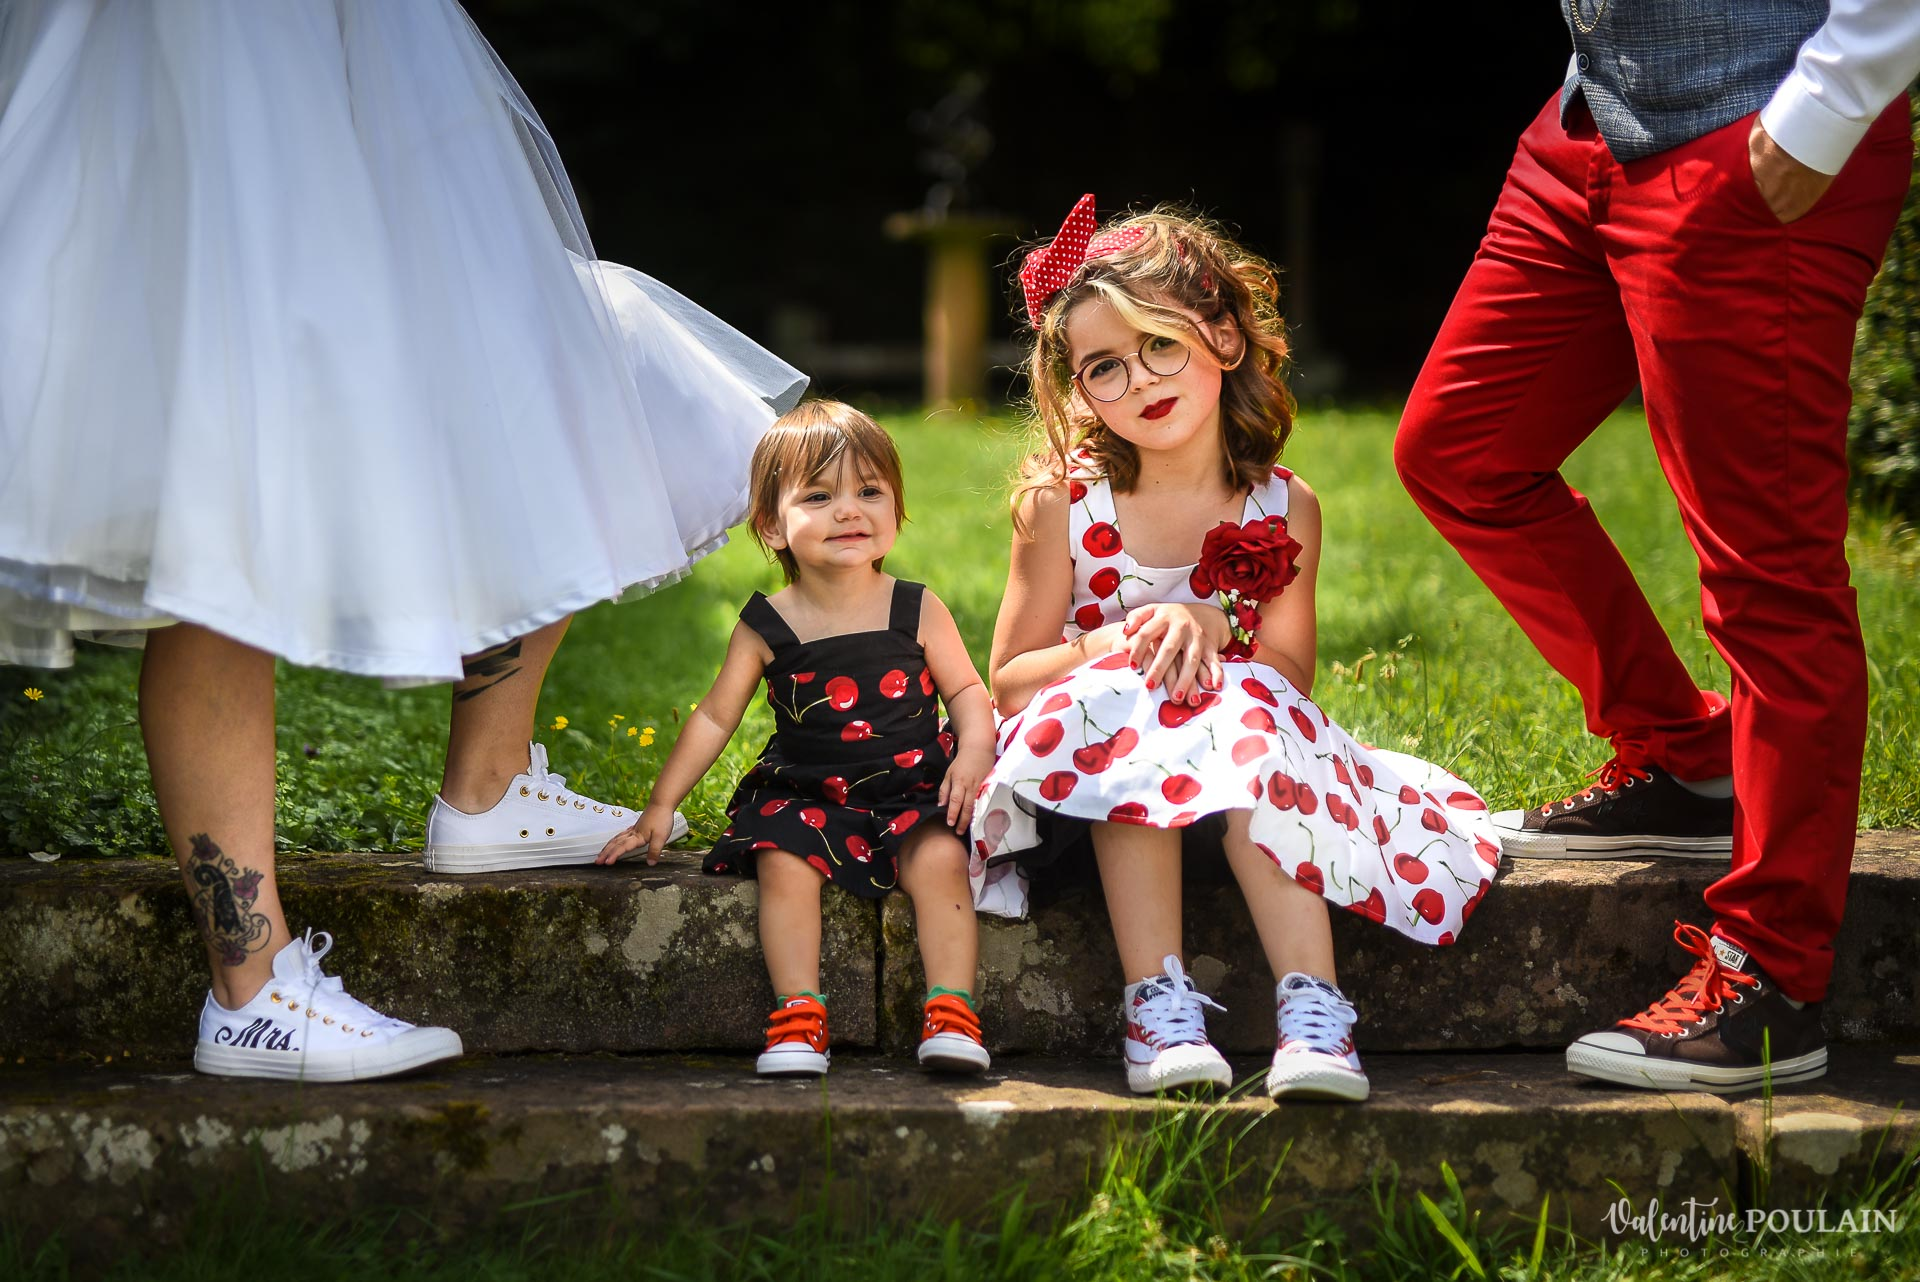 Mariage vintage rockabilly - Valentine Poulain - enfants